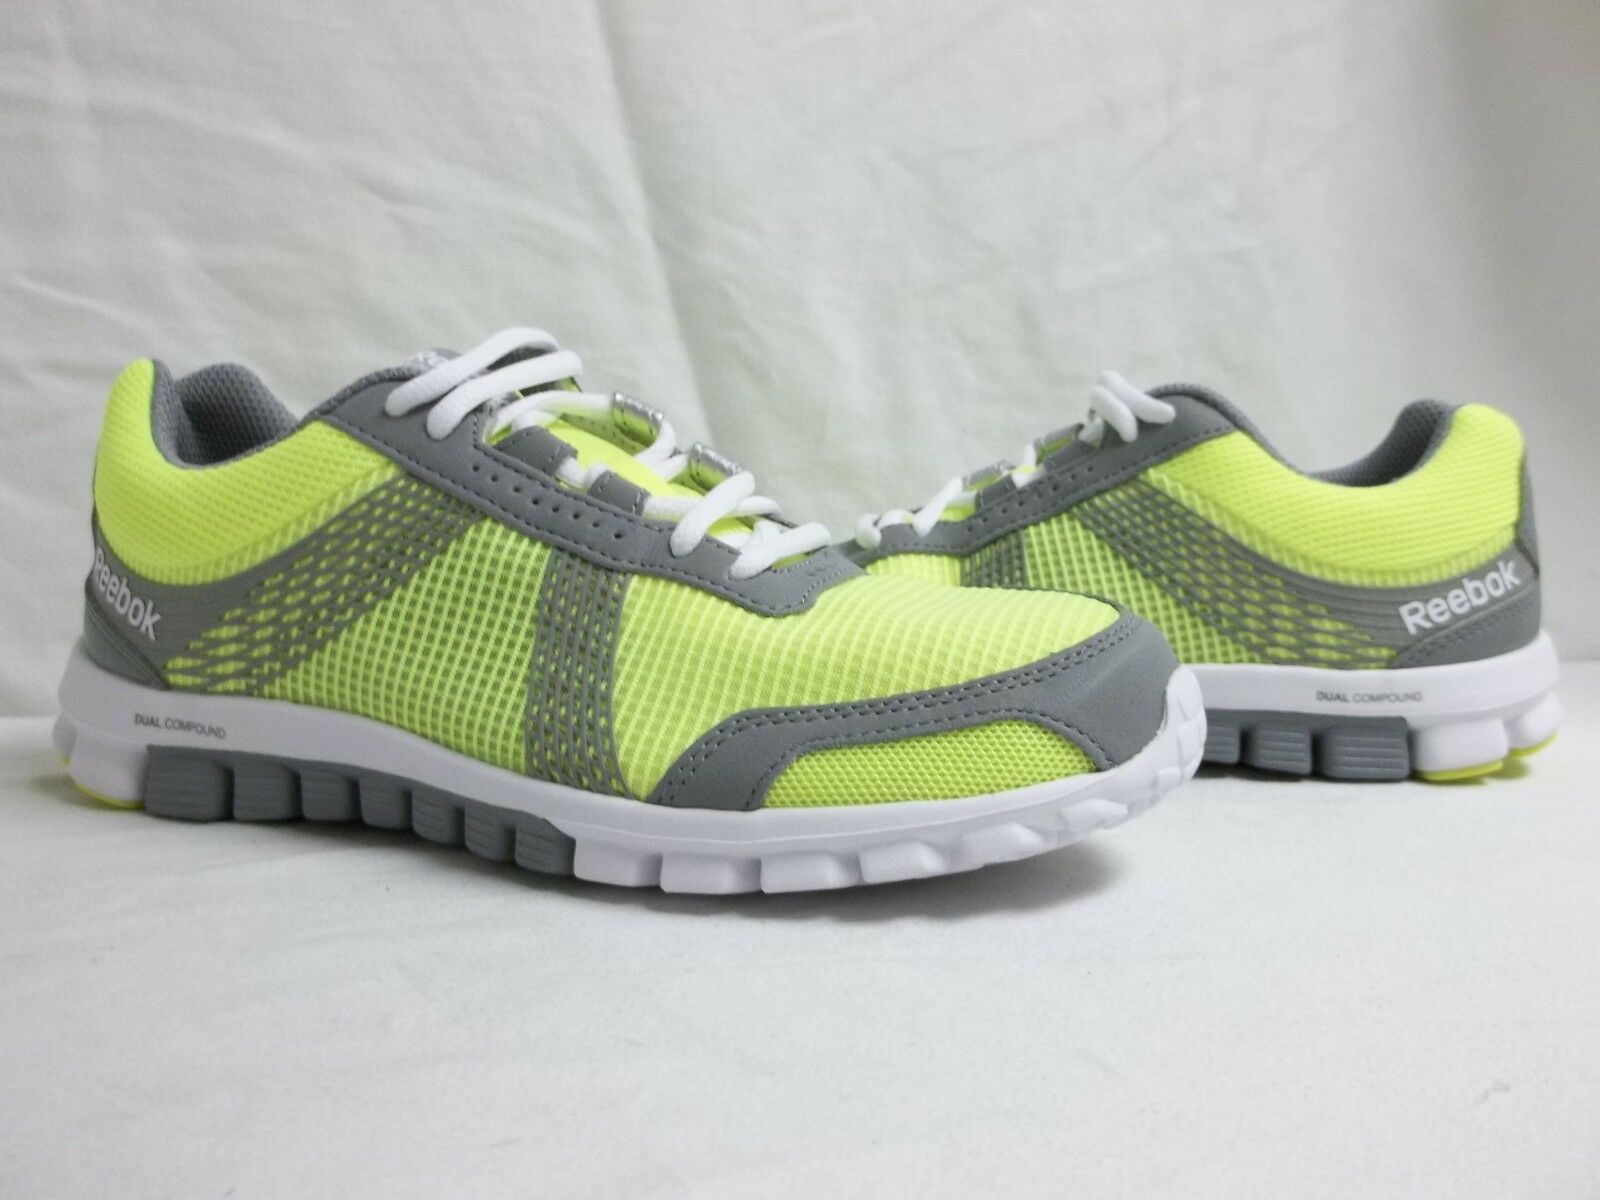 Reebok Sz 8 M RealFlex Tempo Run 2.0 Grau Running Sneakers NEU Damenschuhe Schuhes NWOB